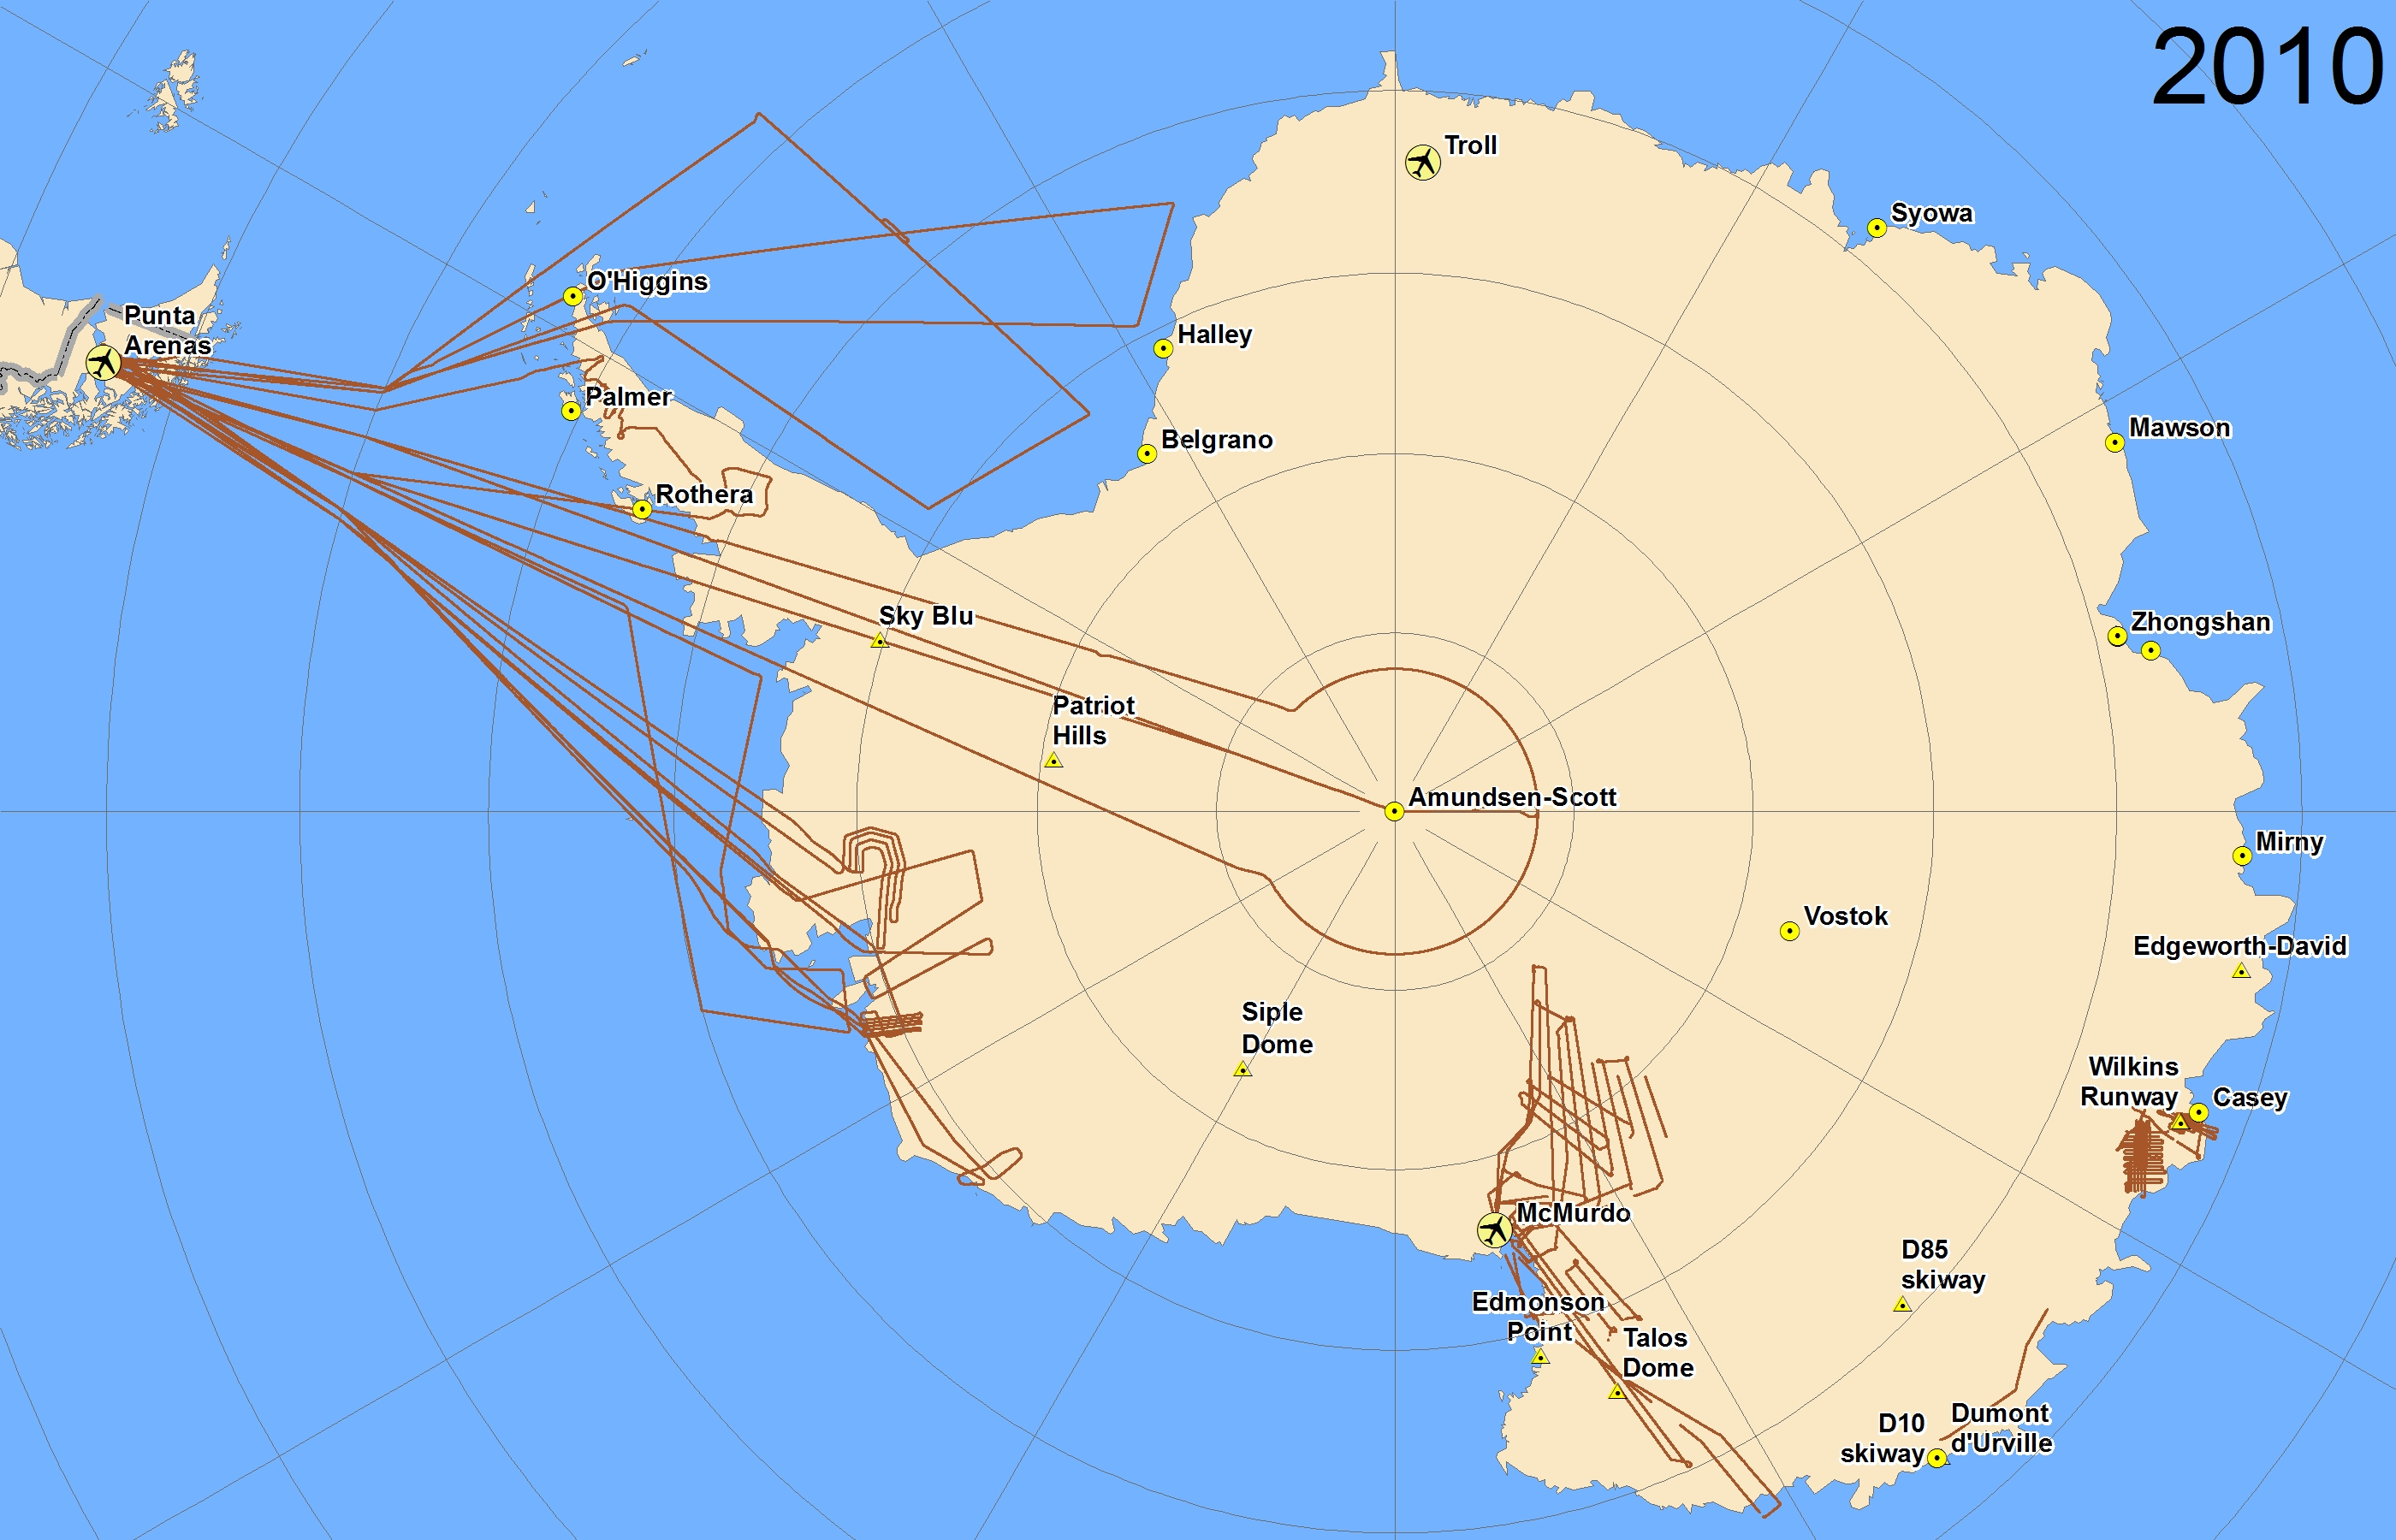 Map of 2010 Antarctic flight lines